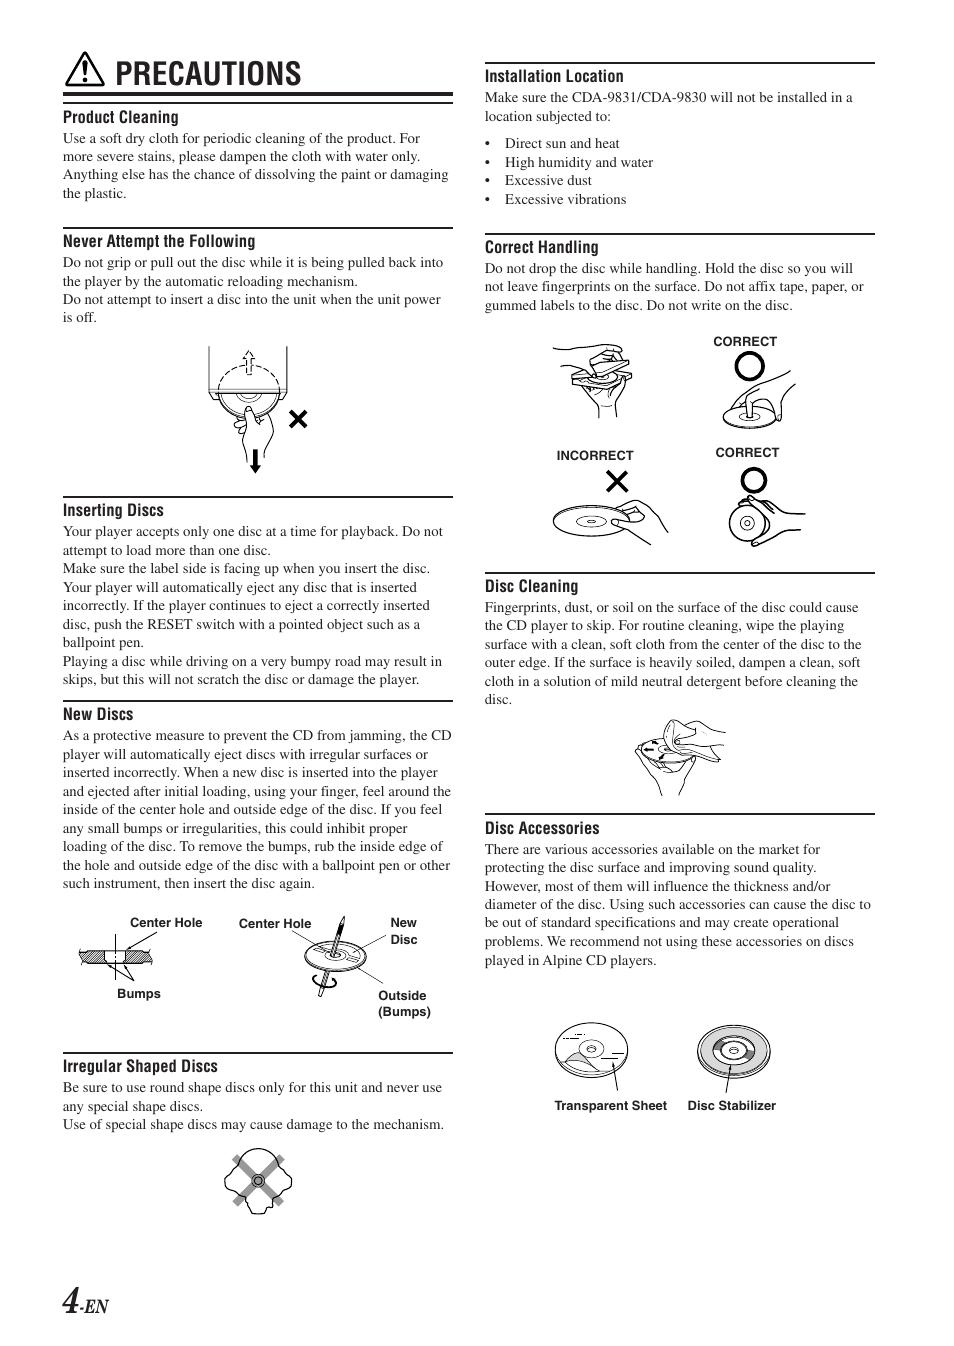 cda 9830 manual